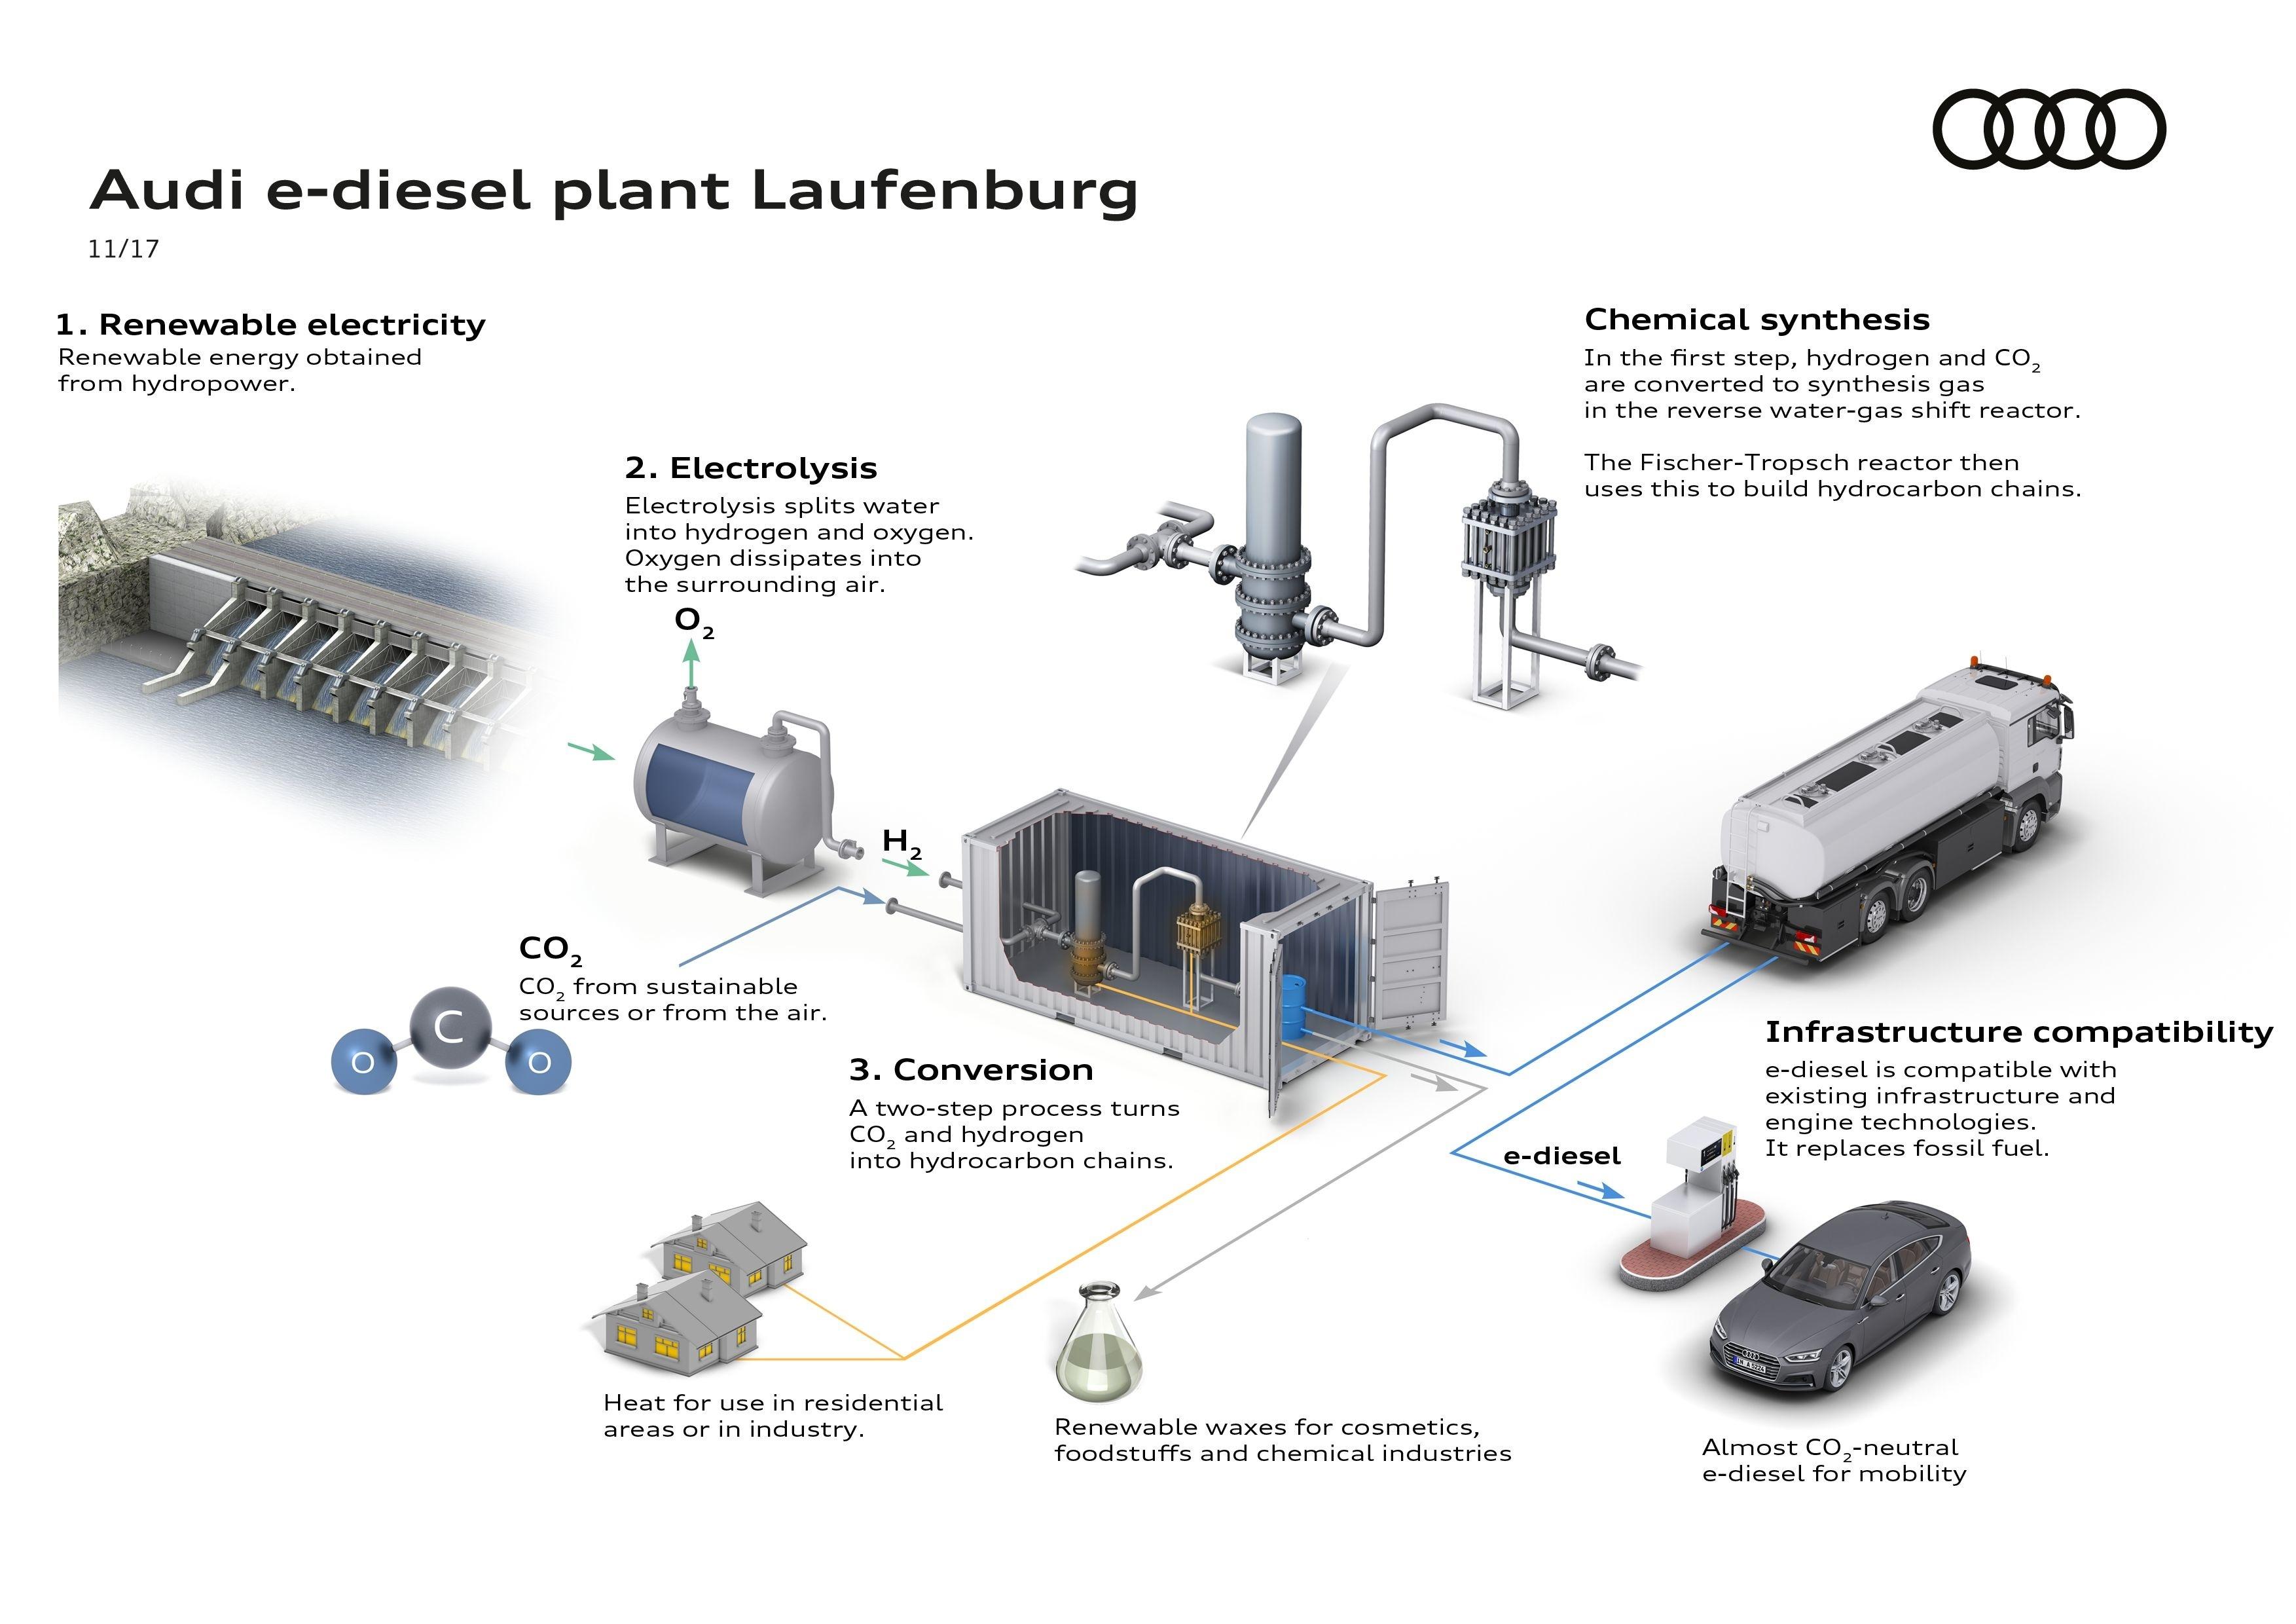 Audi、合成燃料の研究をステップアップ